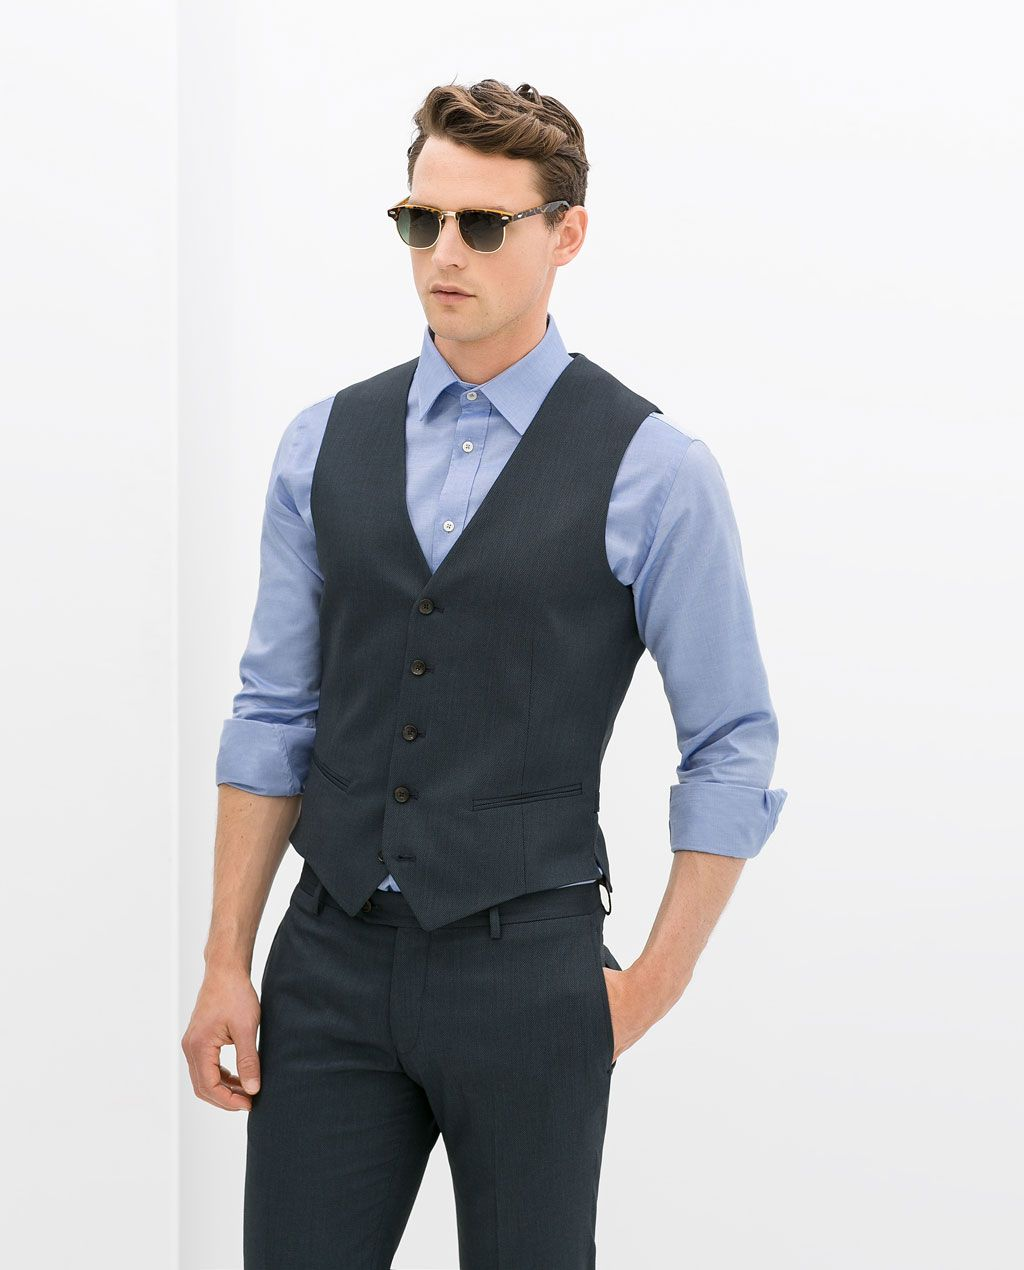 costume zara homme nice,costume zara homme pas cher lyon,costume pour les  femmes 425fa34fa176